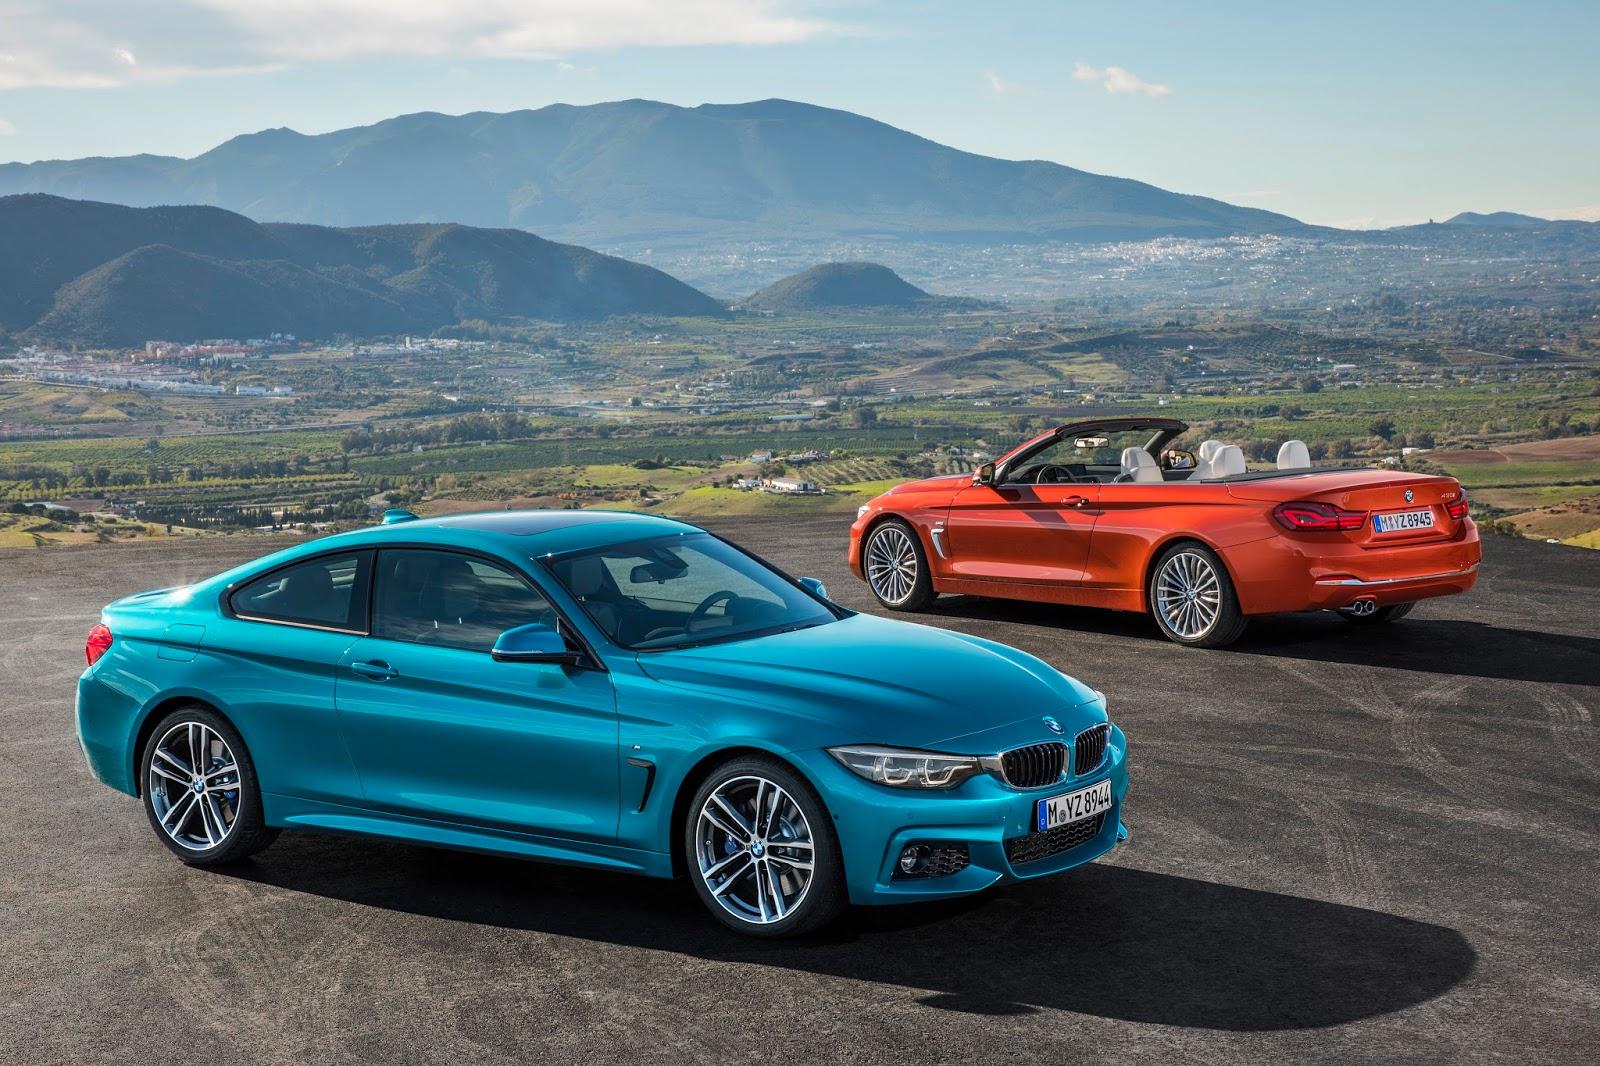 P90245197 highRes the new bmw 4 series Η νέα BMW Σειρά 4, με πιο σφιχτή ρύθμιση ανάρτησης BMW, Bmw 4, BMW 4 Cabrio, BMW 4 Coupe, BMW 4 Gran Coupé, Facelift